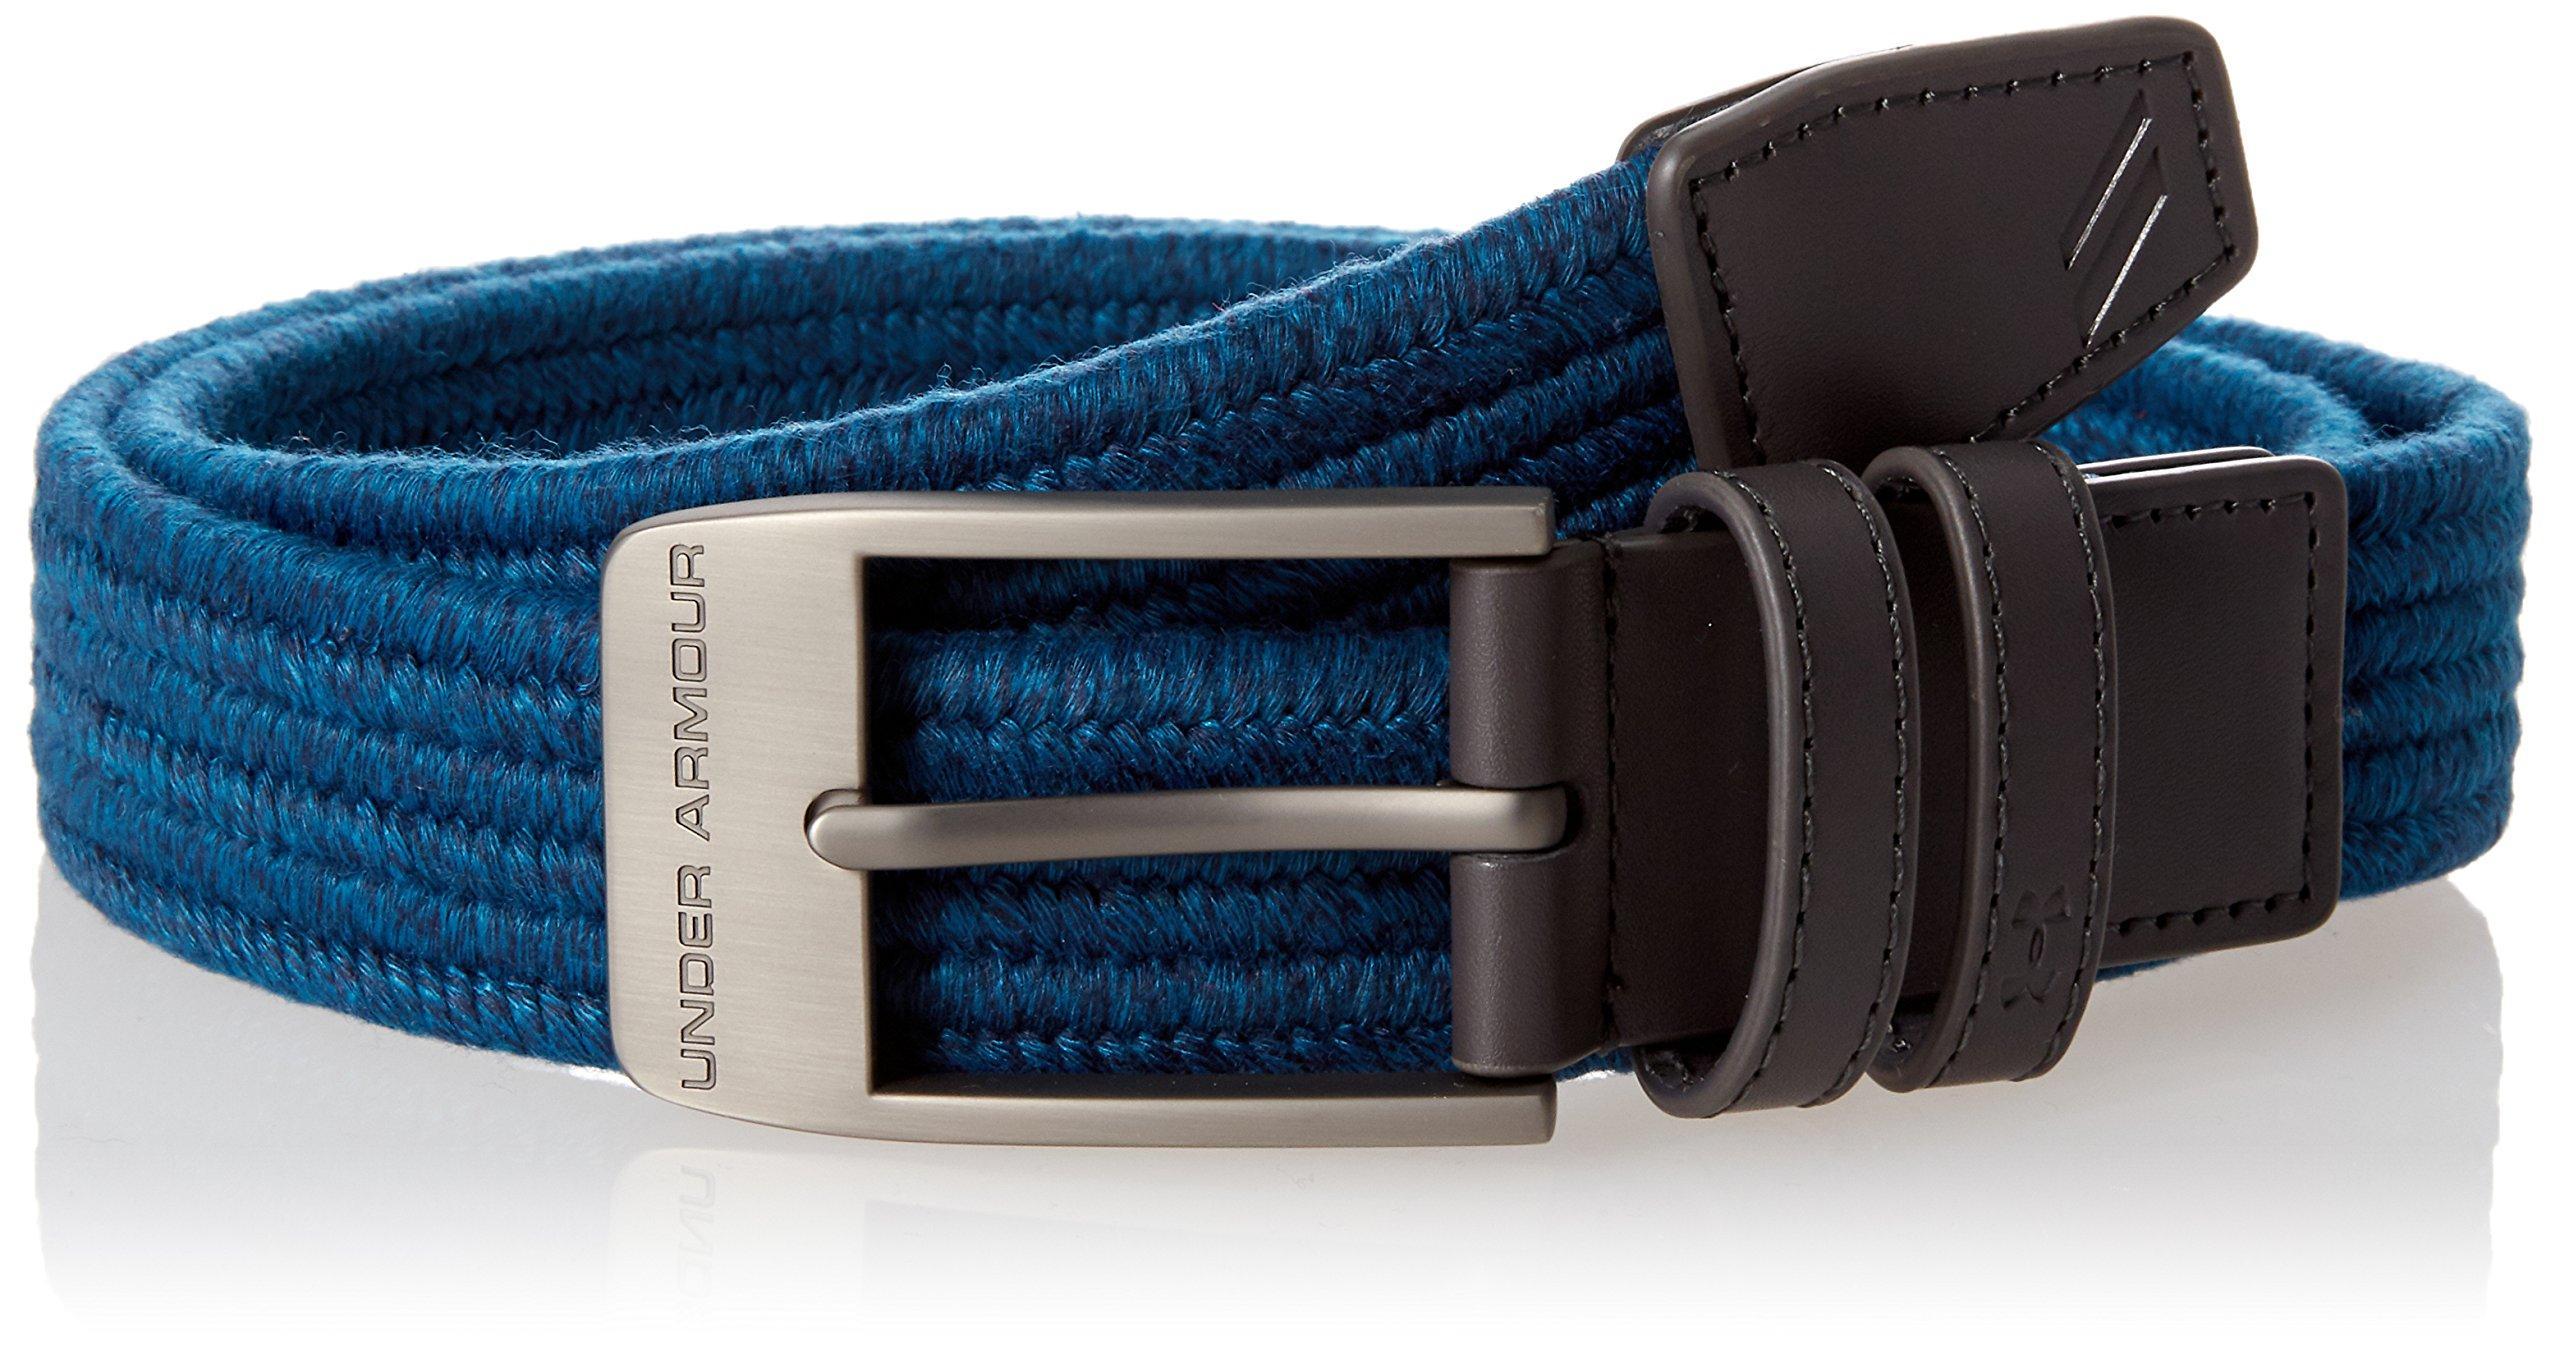 Under Armour Men's Braided 2.0 Belt, Static Blue, 30